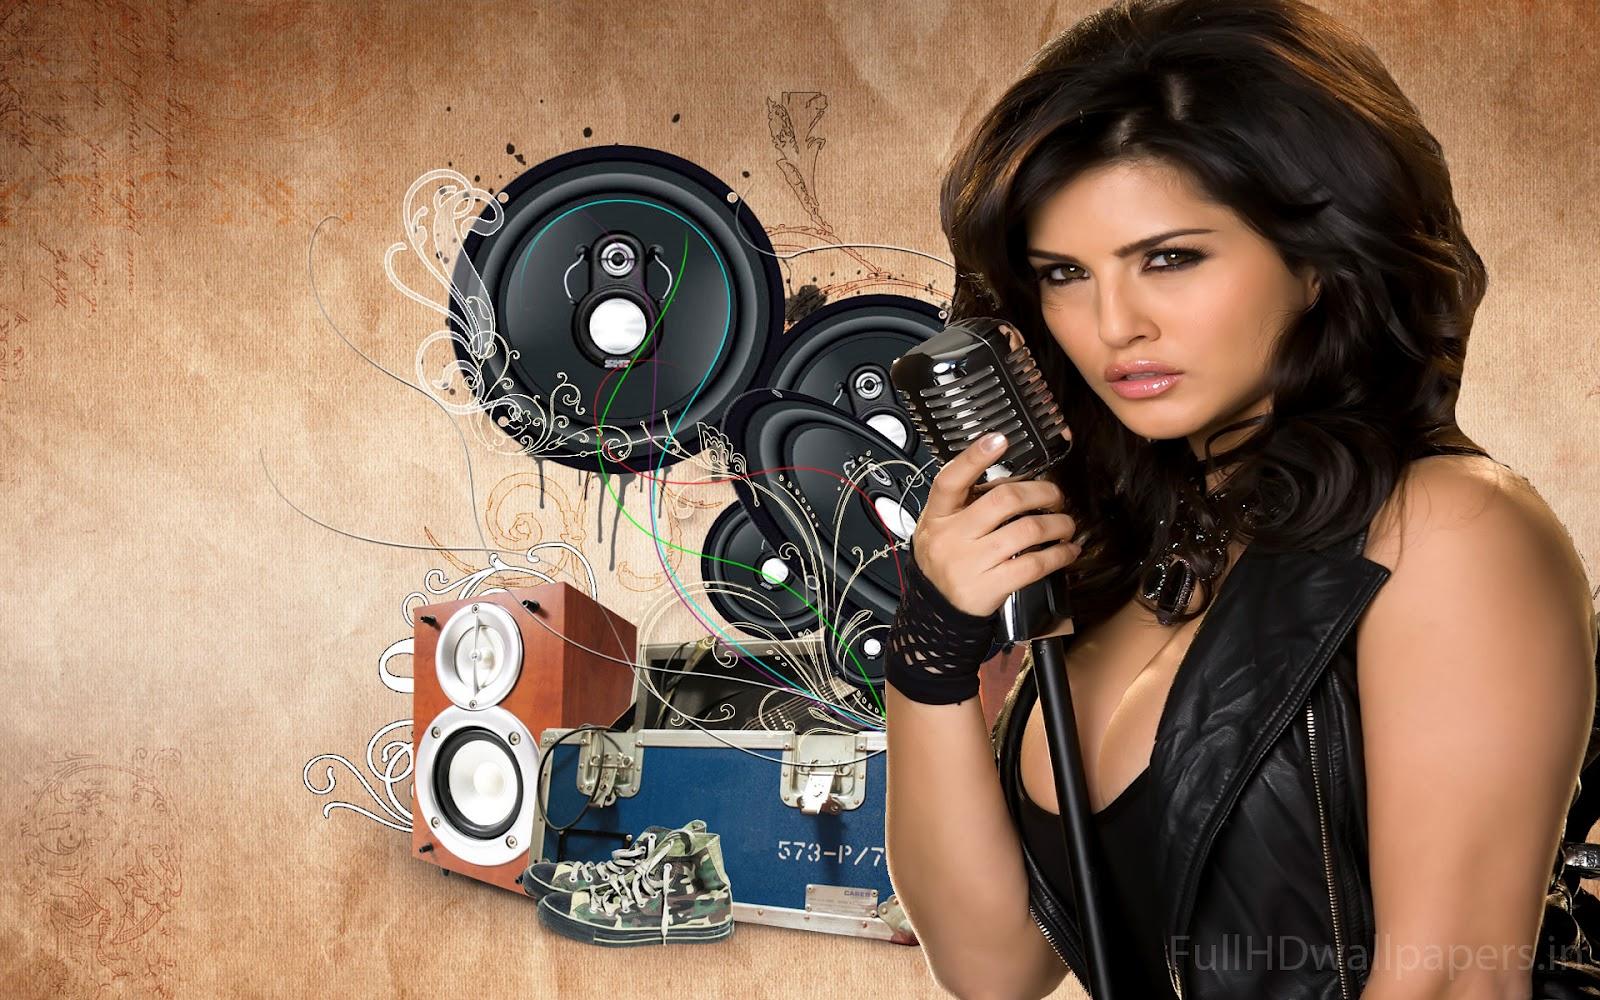 Sunny Leone Pictures Sexy Hot - Alessandra Delicadeza-7871